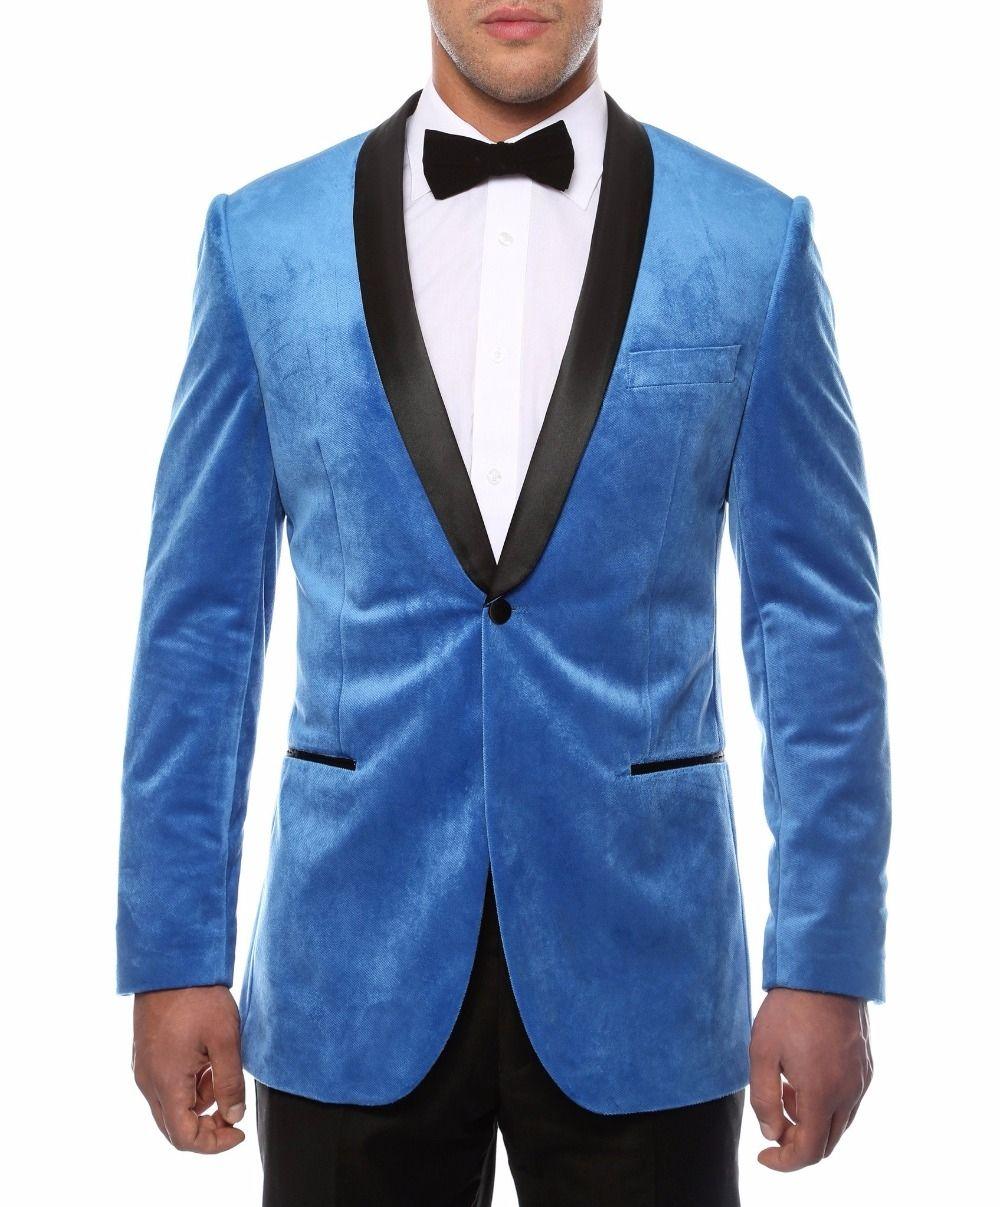 2018 Latest Coat Pant Designs Sky Blue Velvet Wedding Suits for Men ...